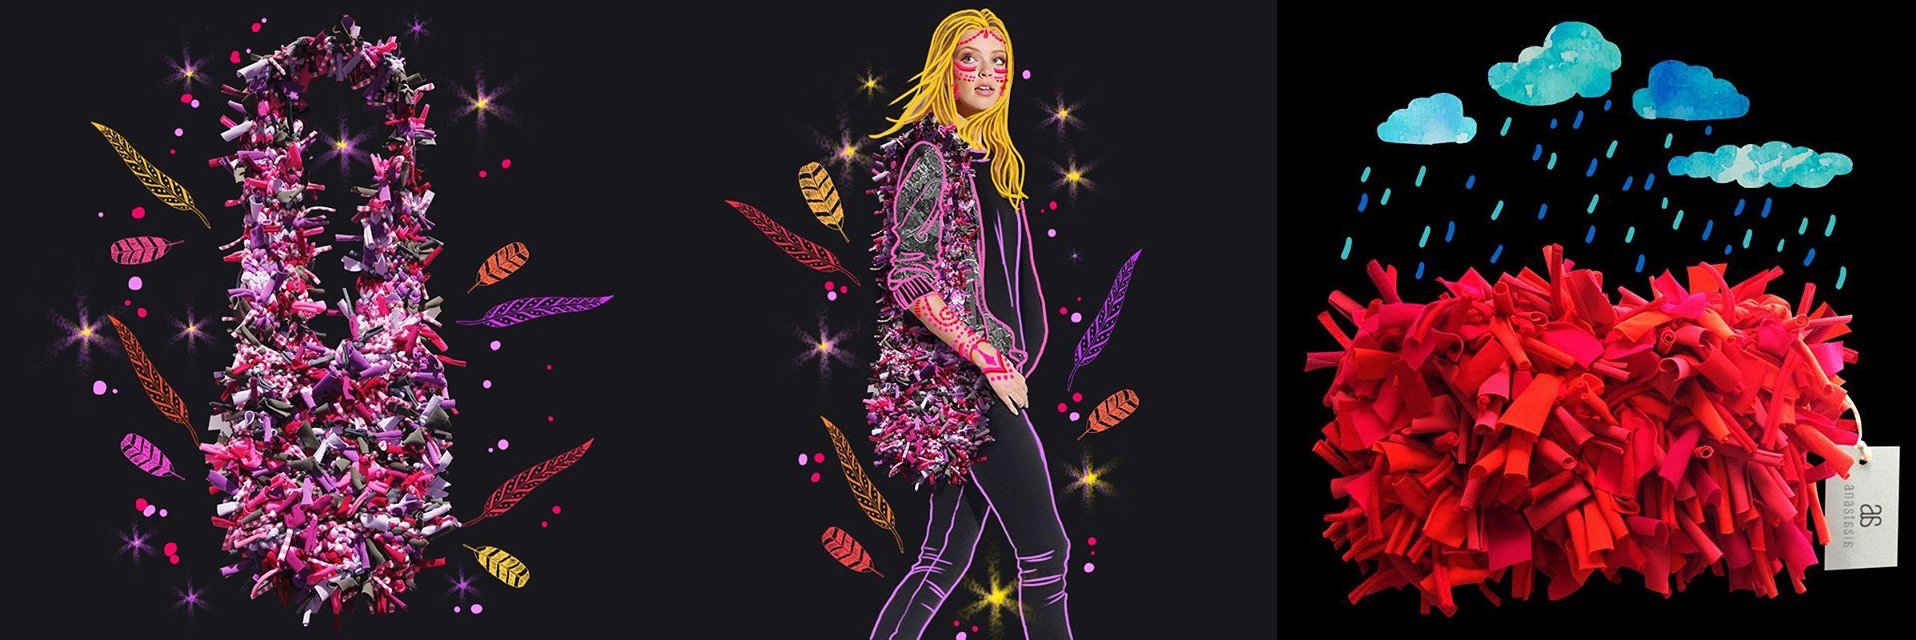 fashion blogger spain valencia, anastasia ecothique social eco-friendly fashion, clutch handbag sustainablefashion